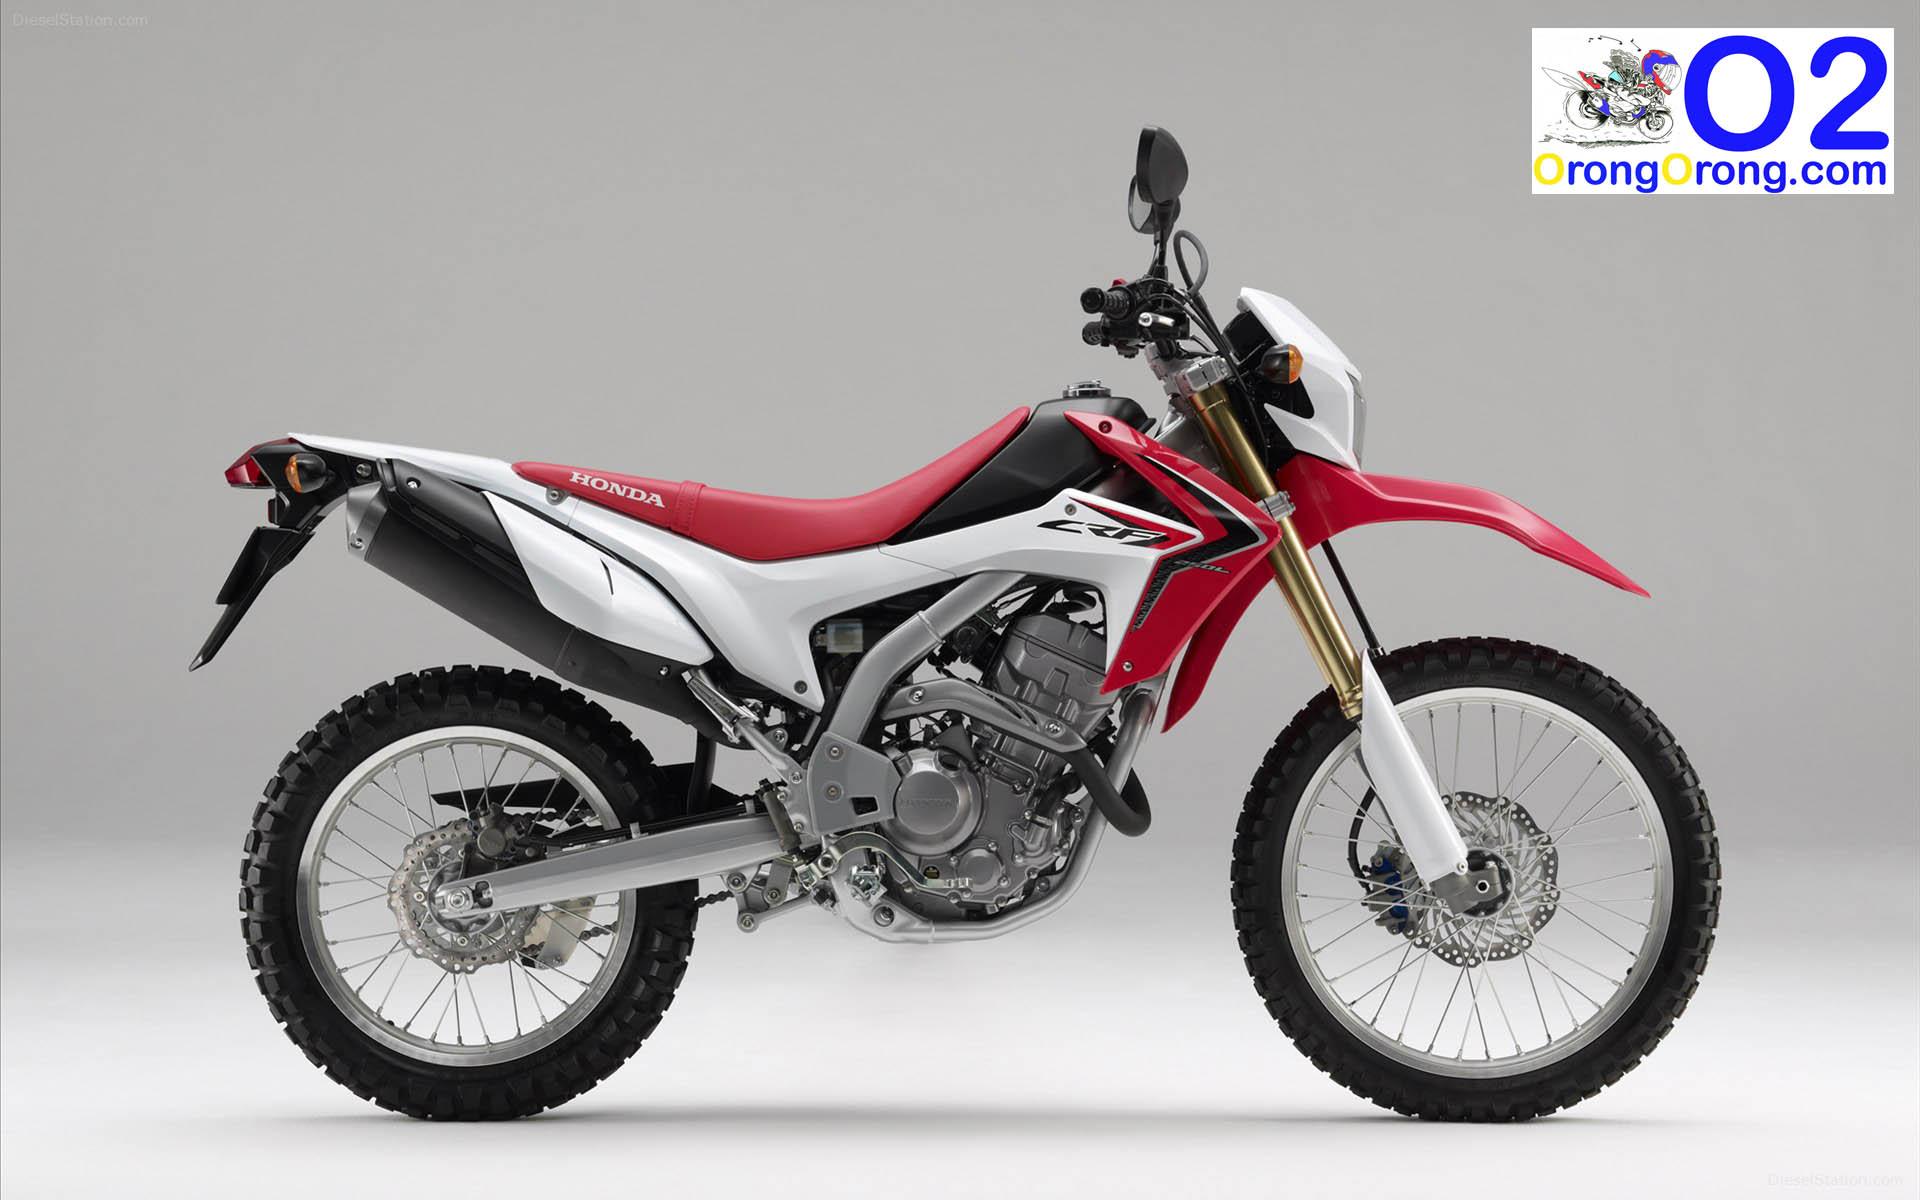 Modifikasi Motor Honda Kirana 125cc Dunia Otomotif